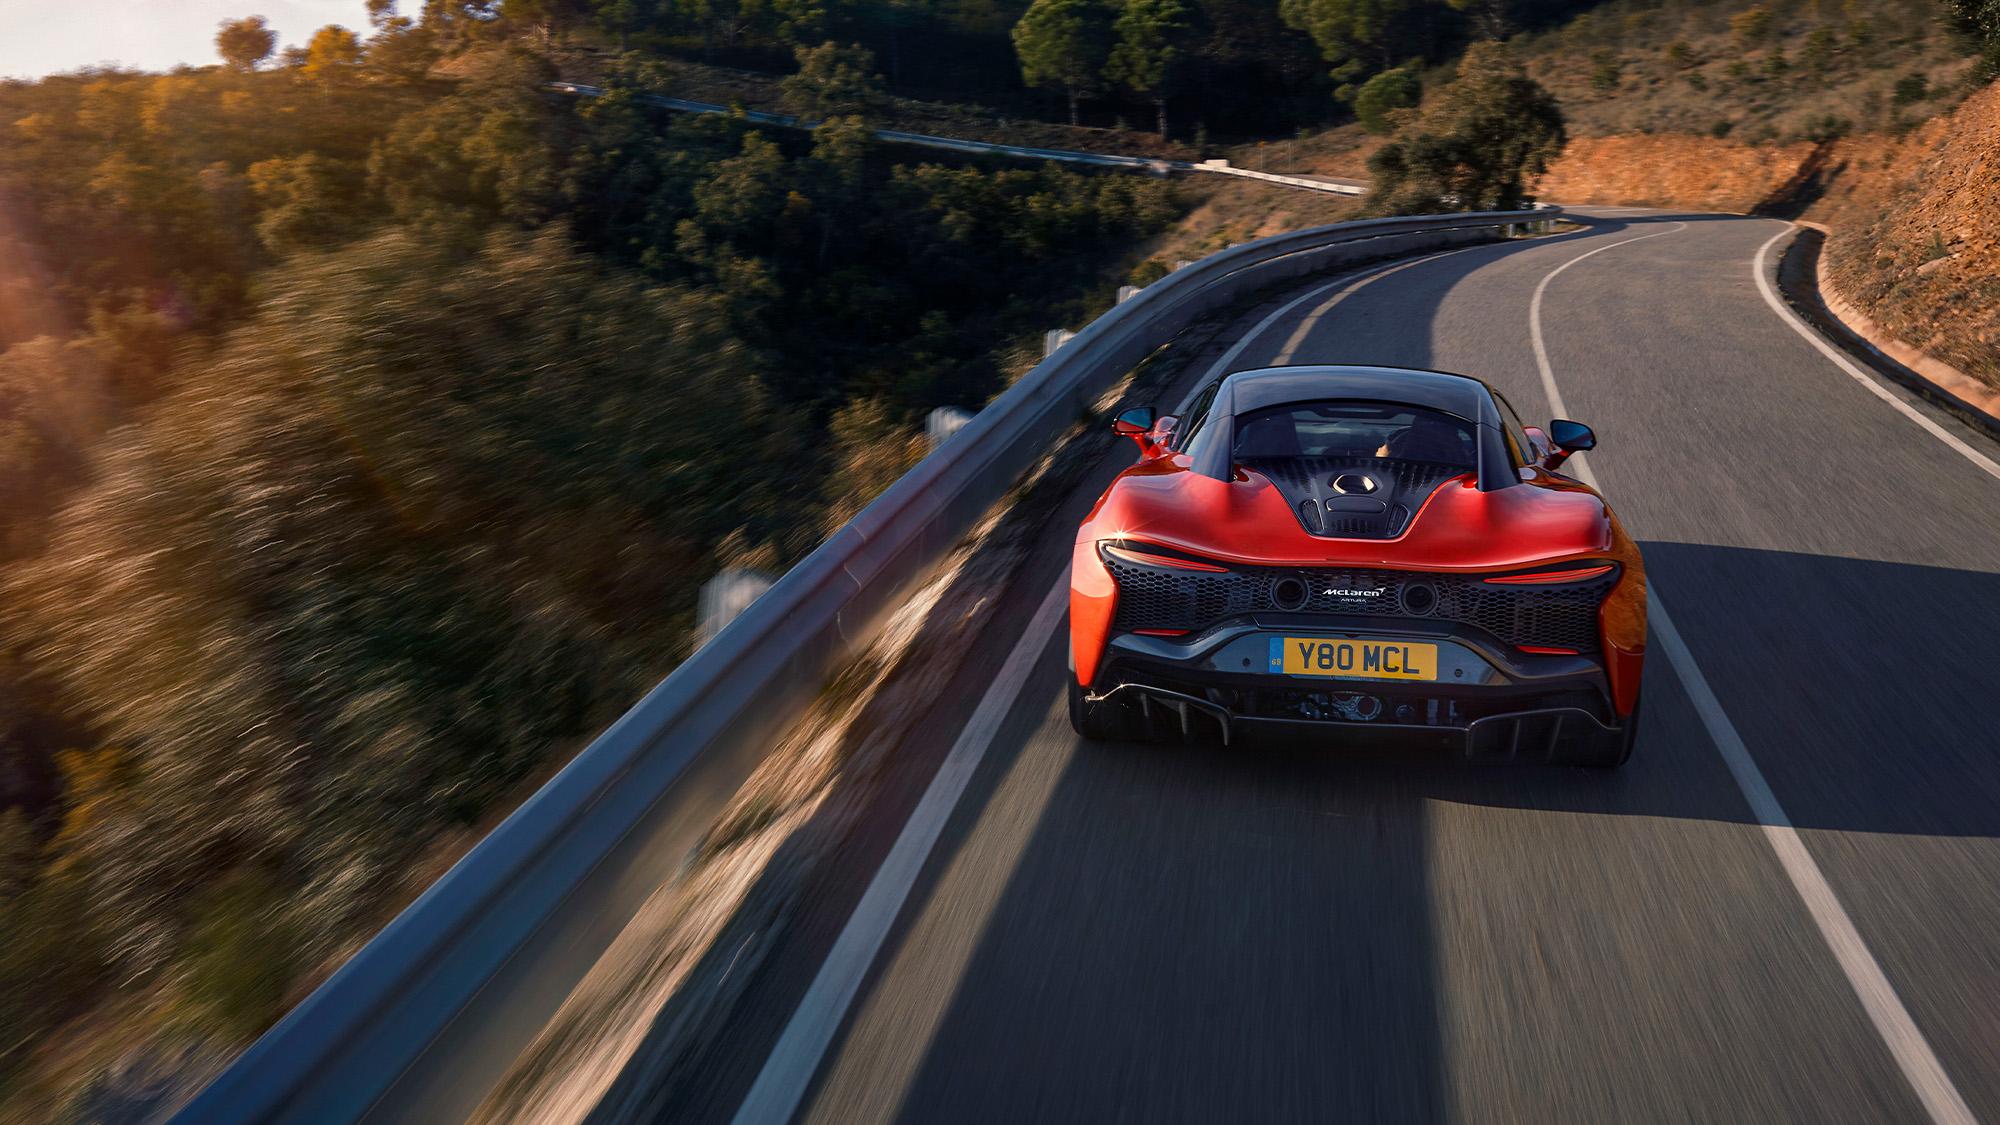 2021 McLaren Artura rear on road